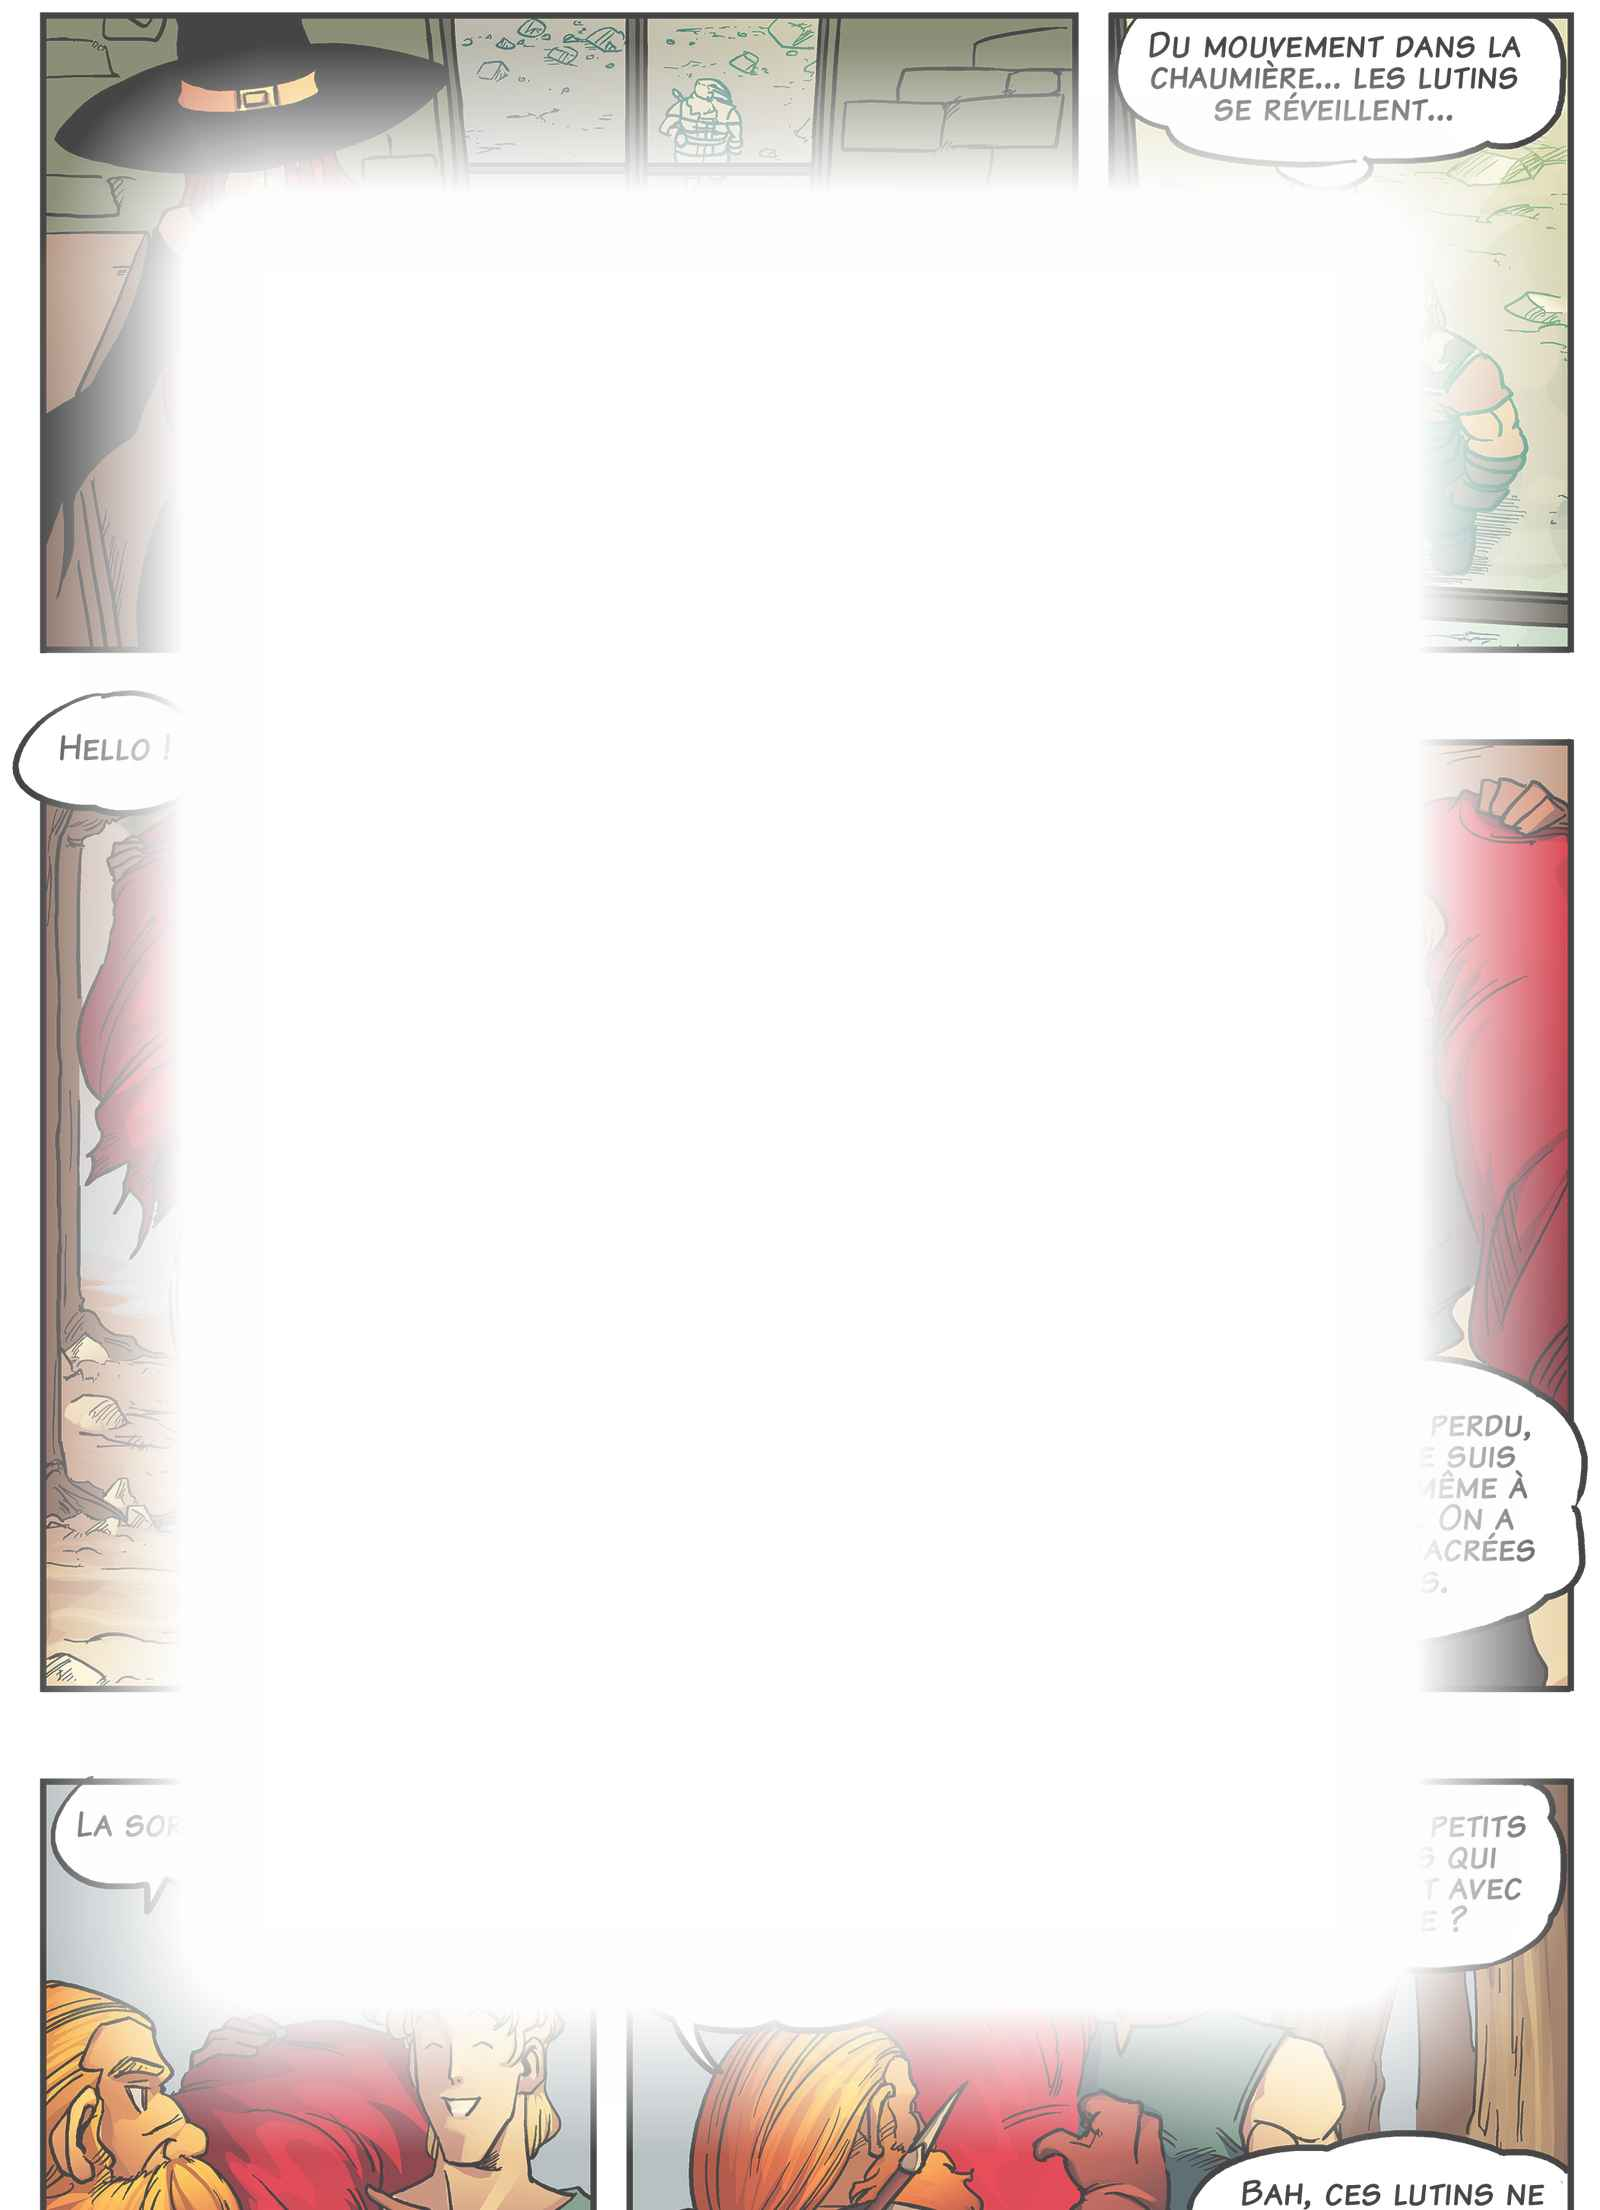 Hémisphères : チャプター 11 ページ 18